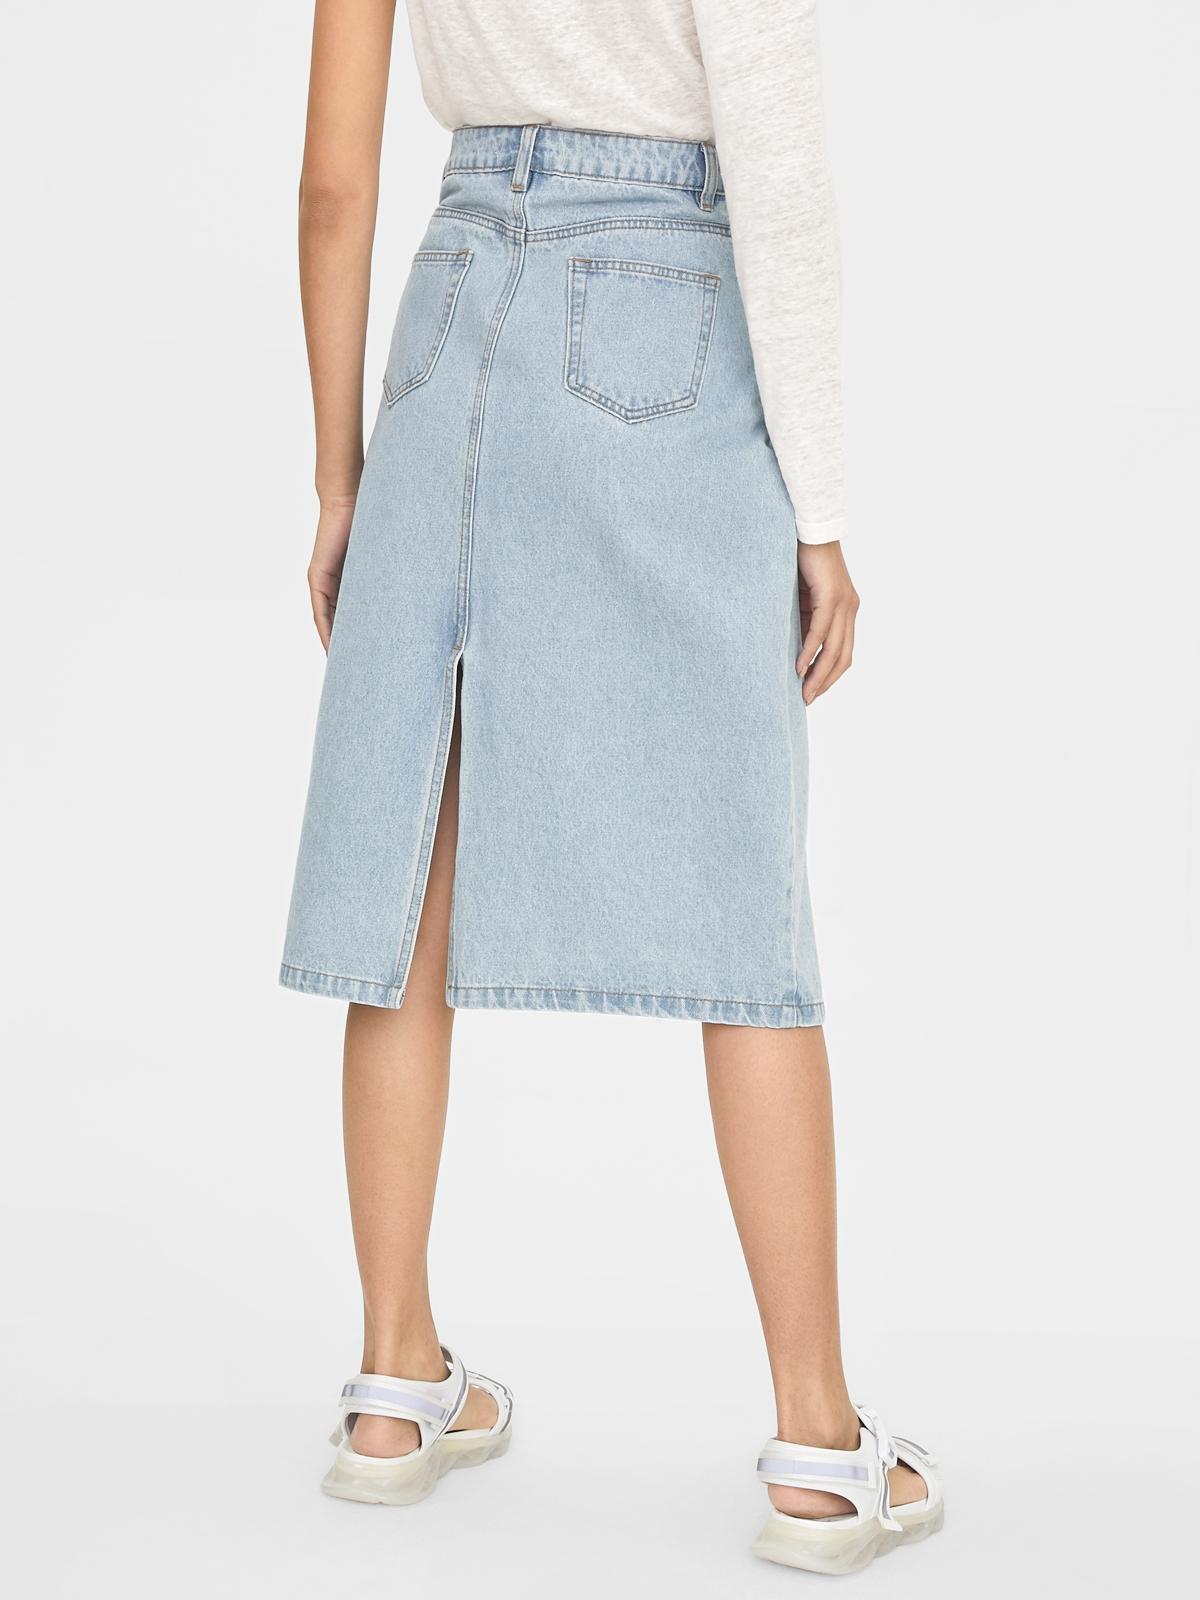 Indigo Front And Back Slit Skirt Light Blue